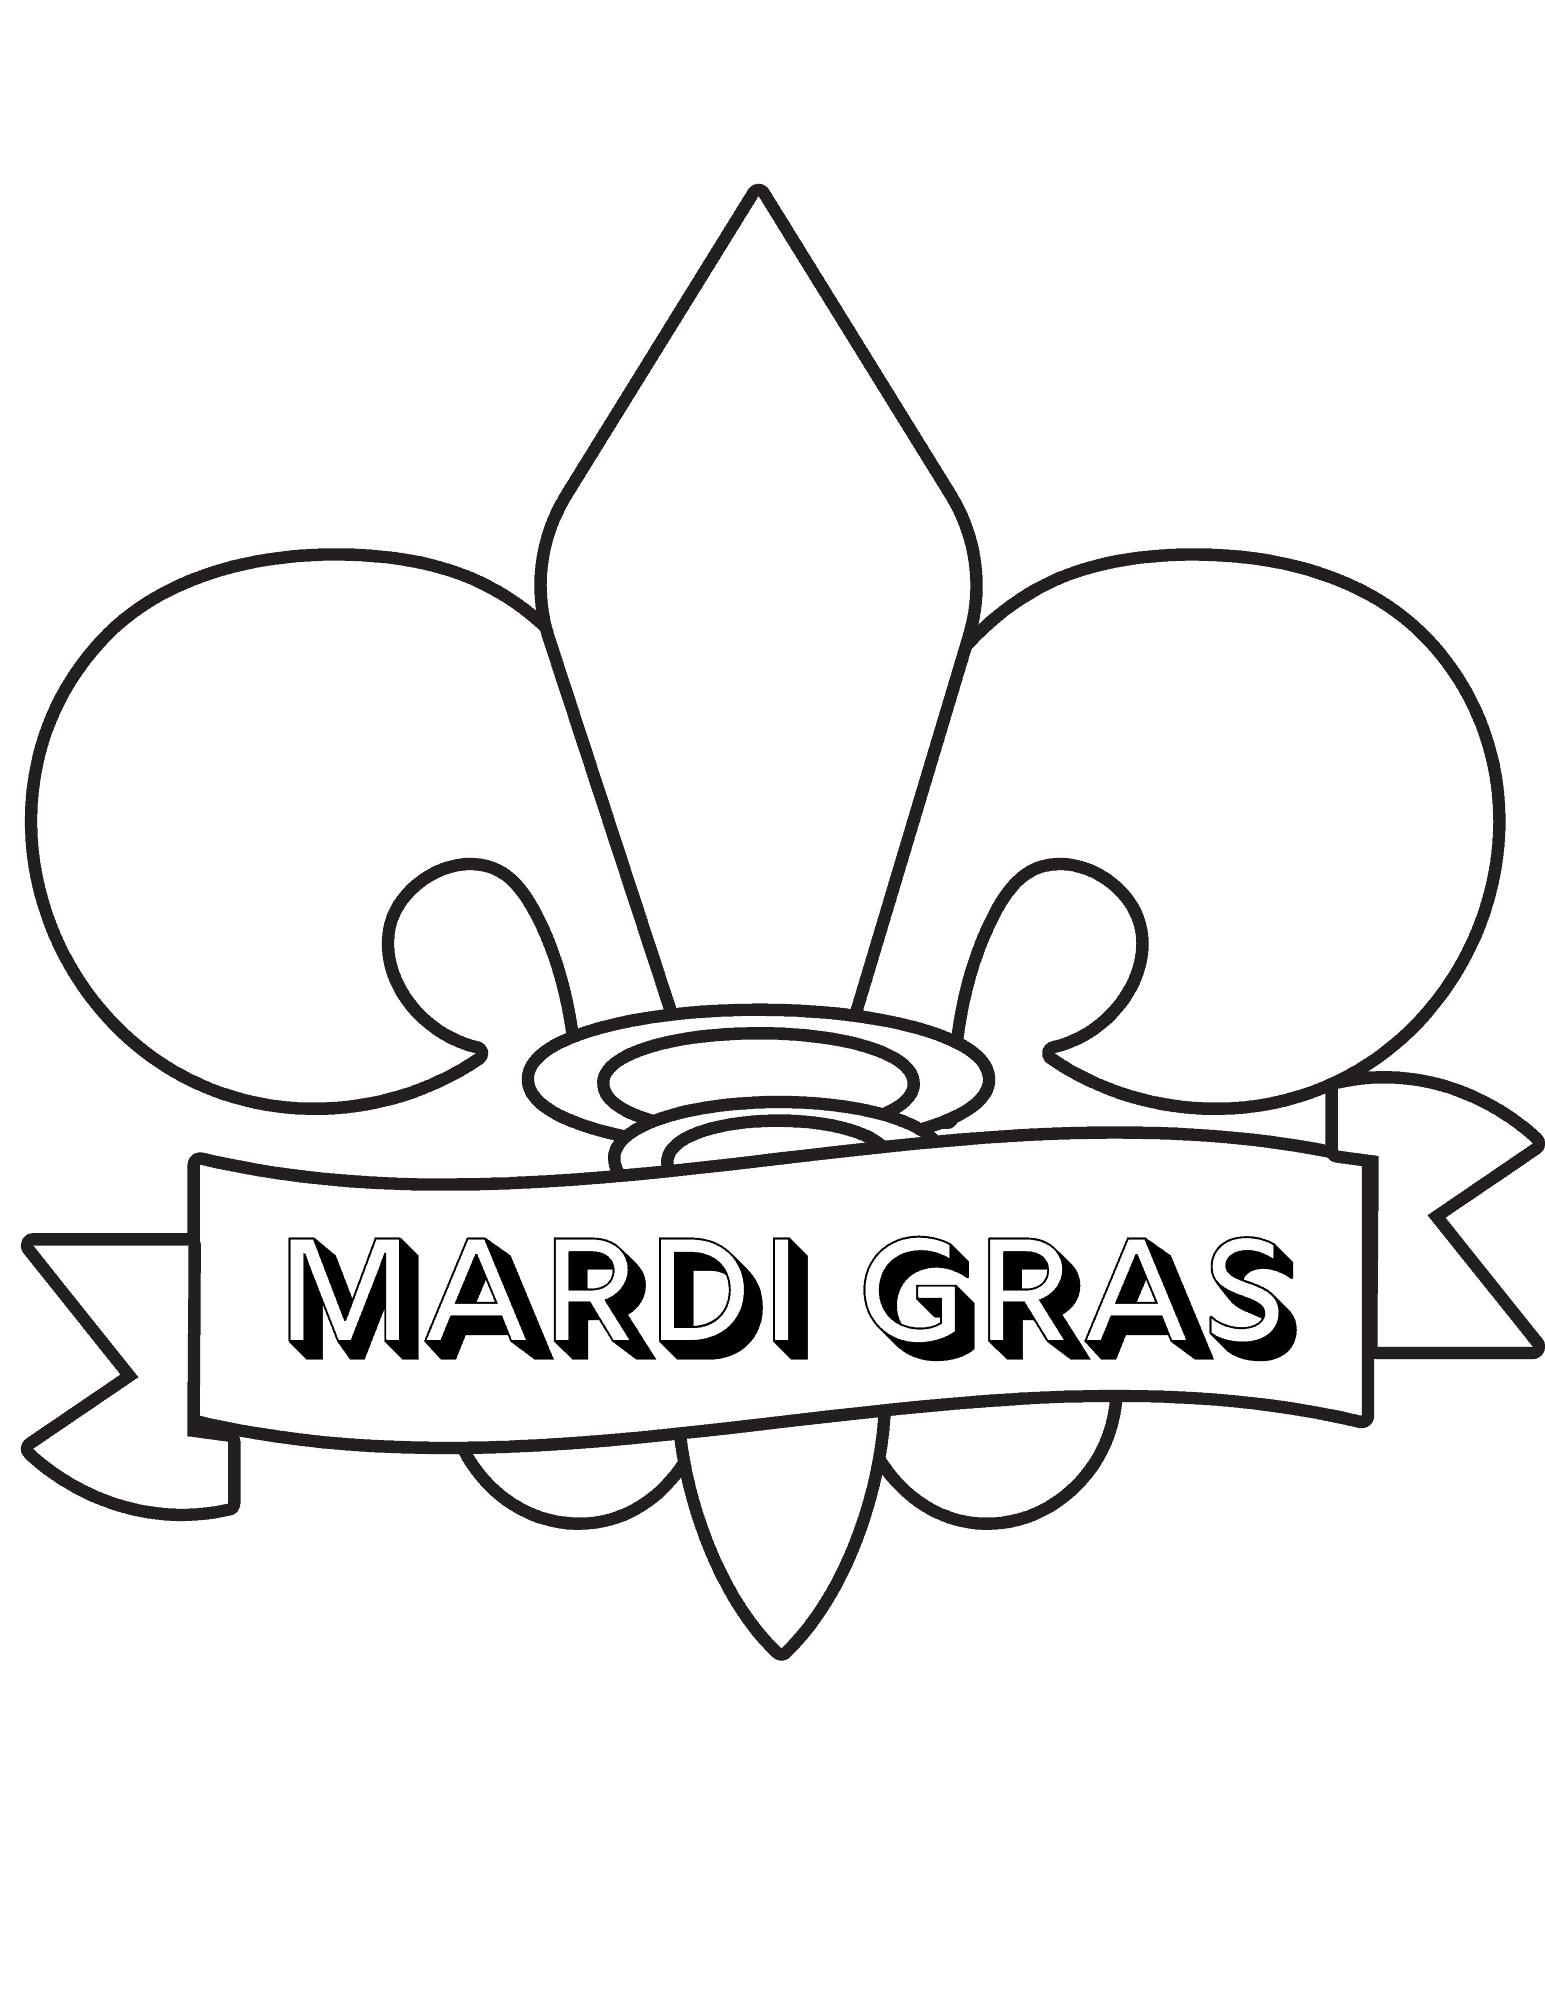 Sundays With The Saints Mardi Gras In